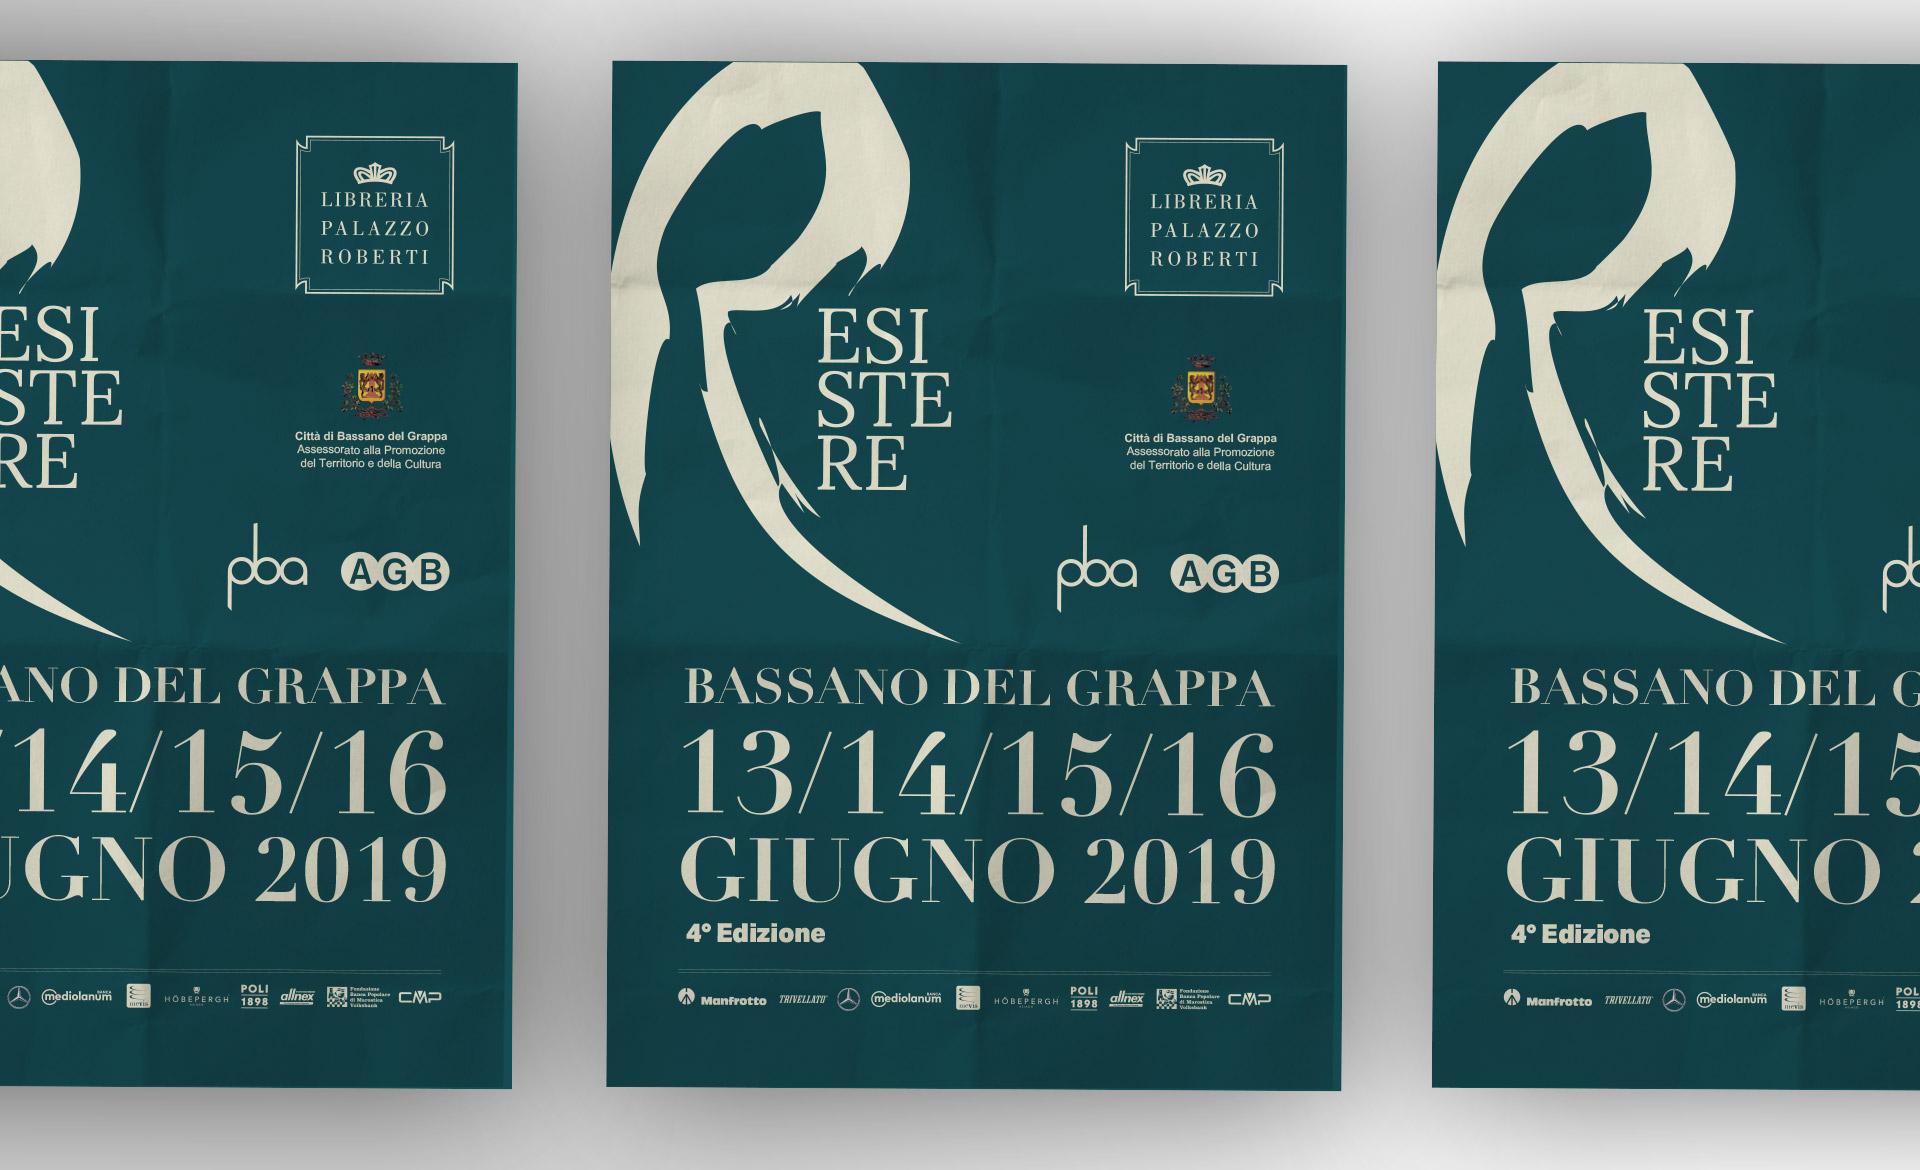 Resistere-Palazzo-Roberti-Blank-2019-5